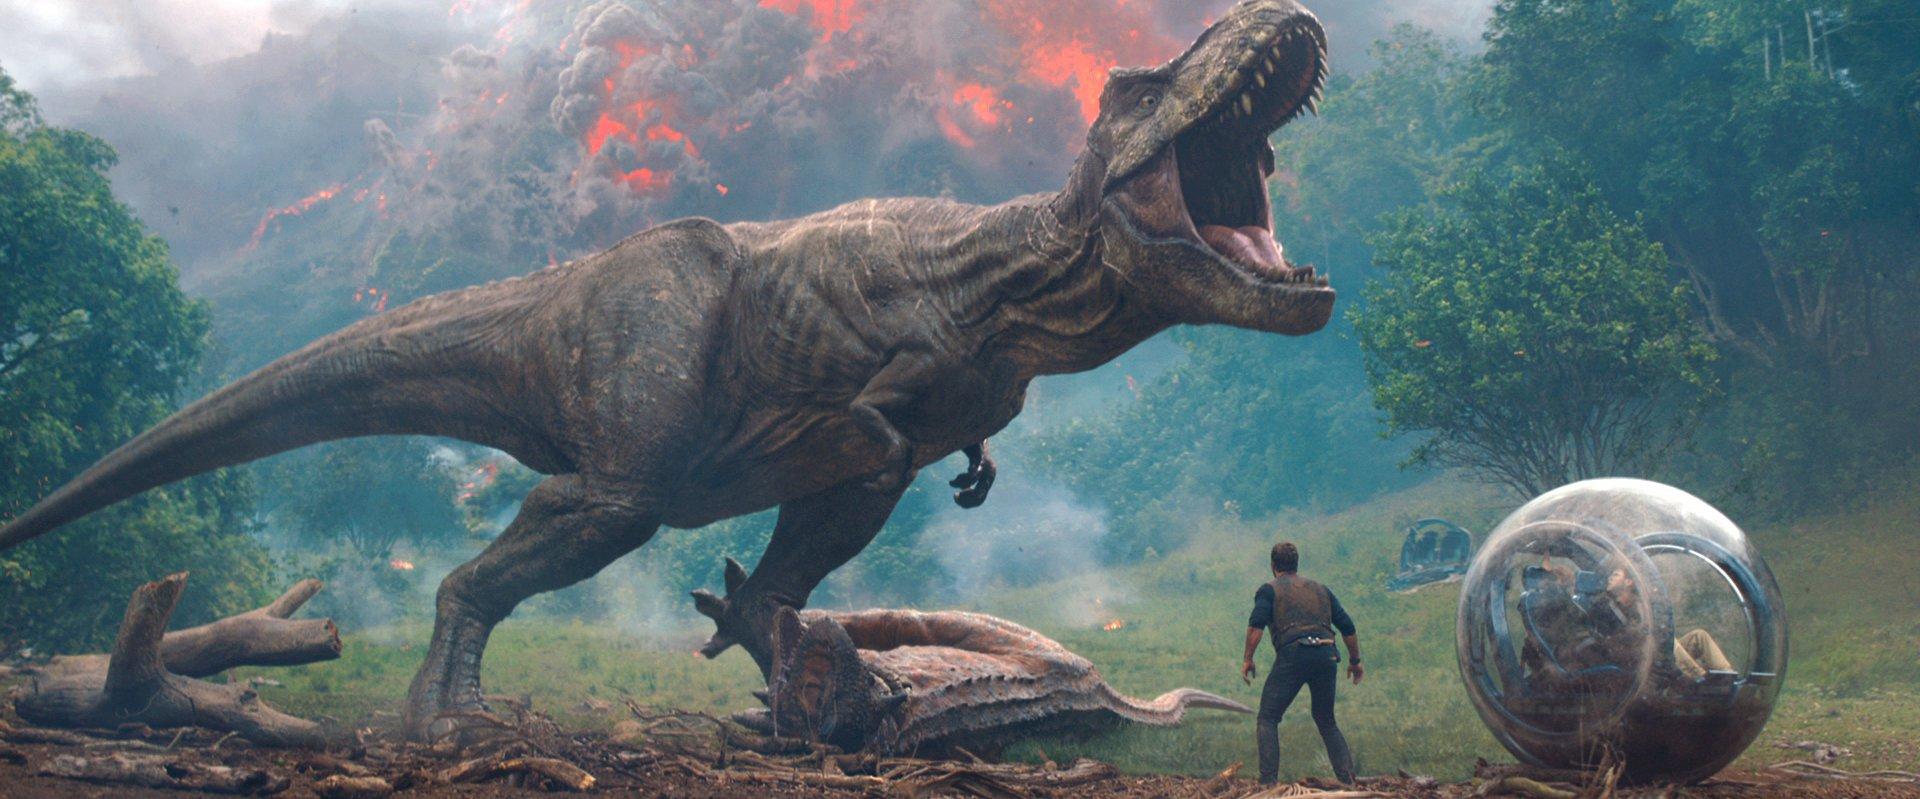 Still of T. Rex in Jurassic World: Fallen Kingdom